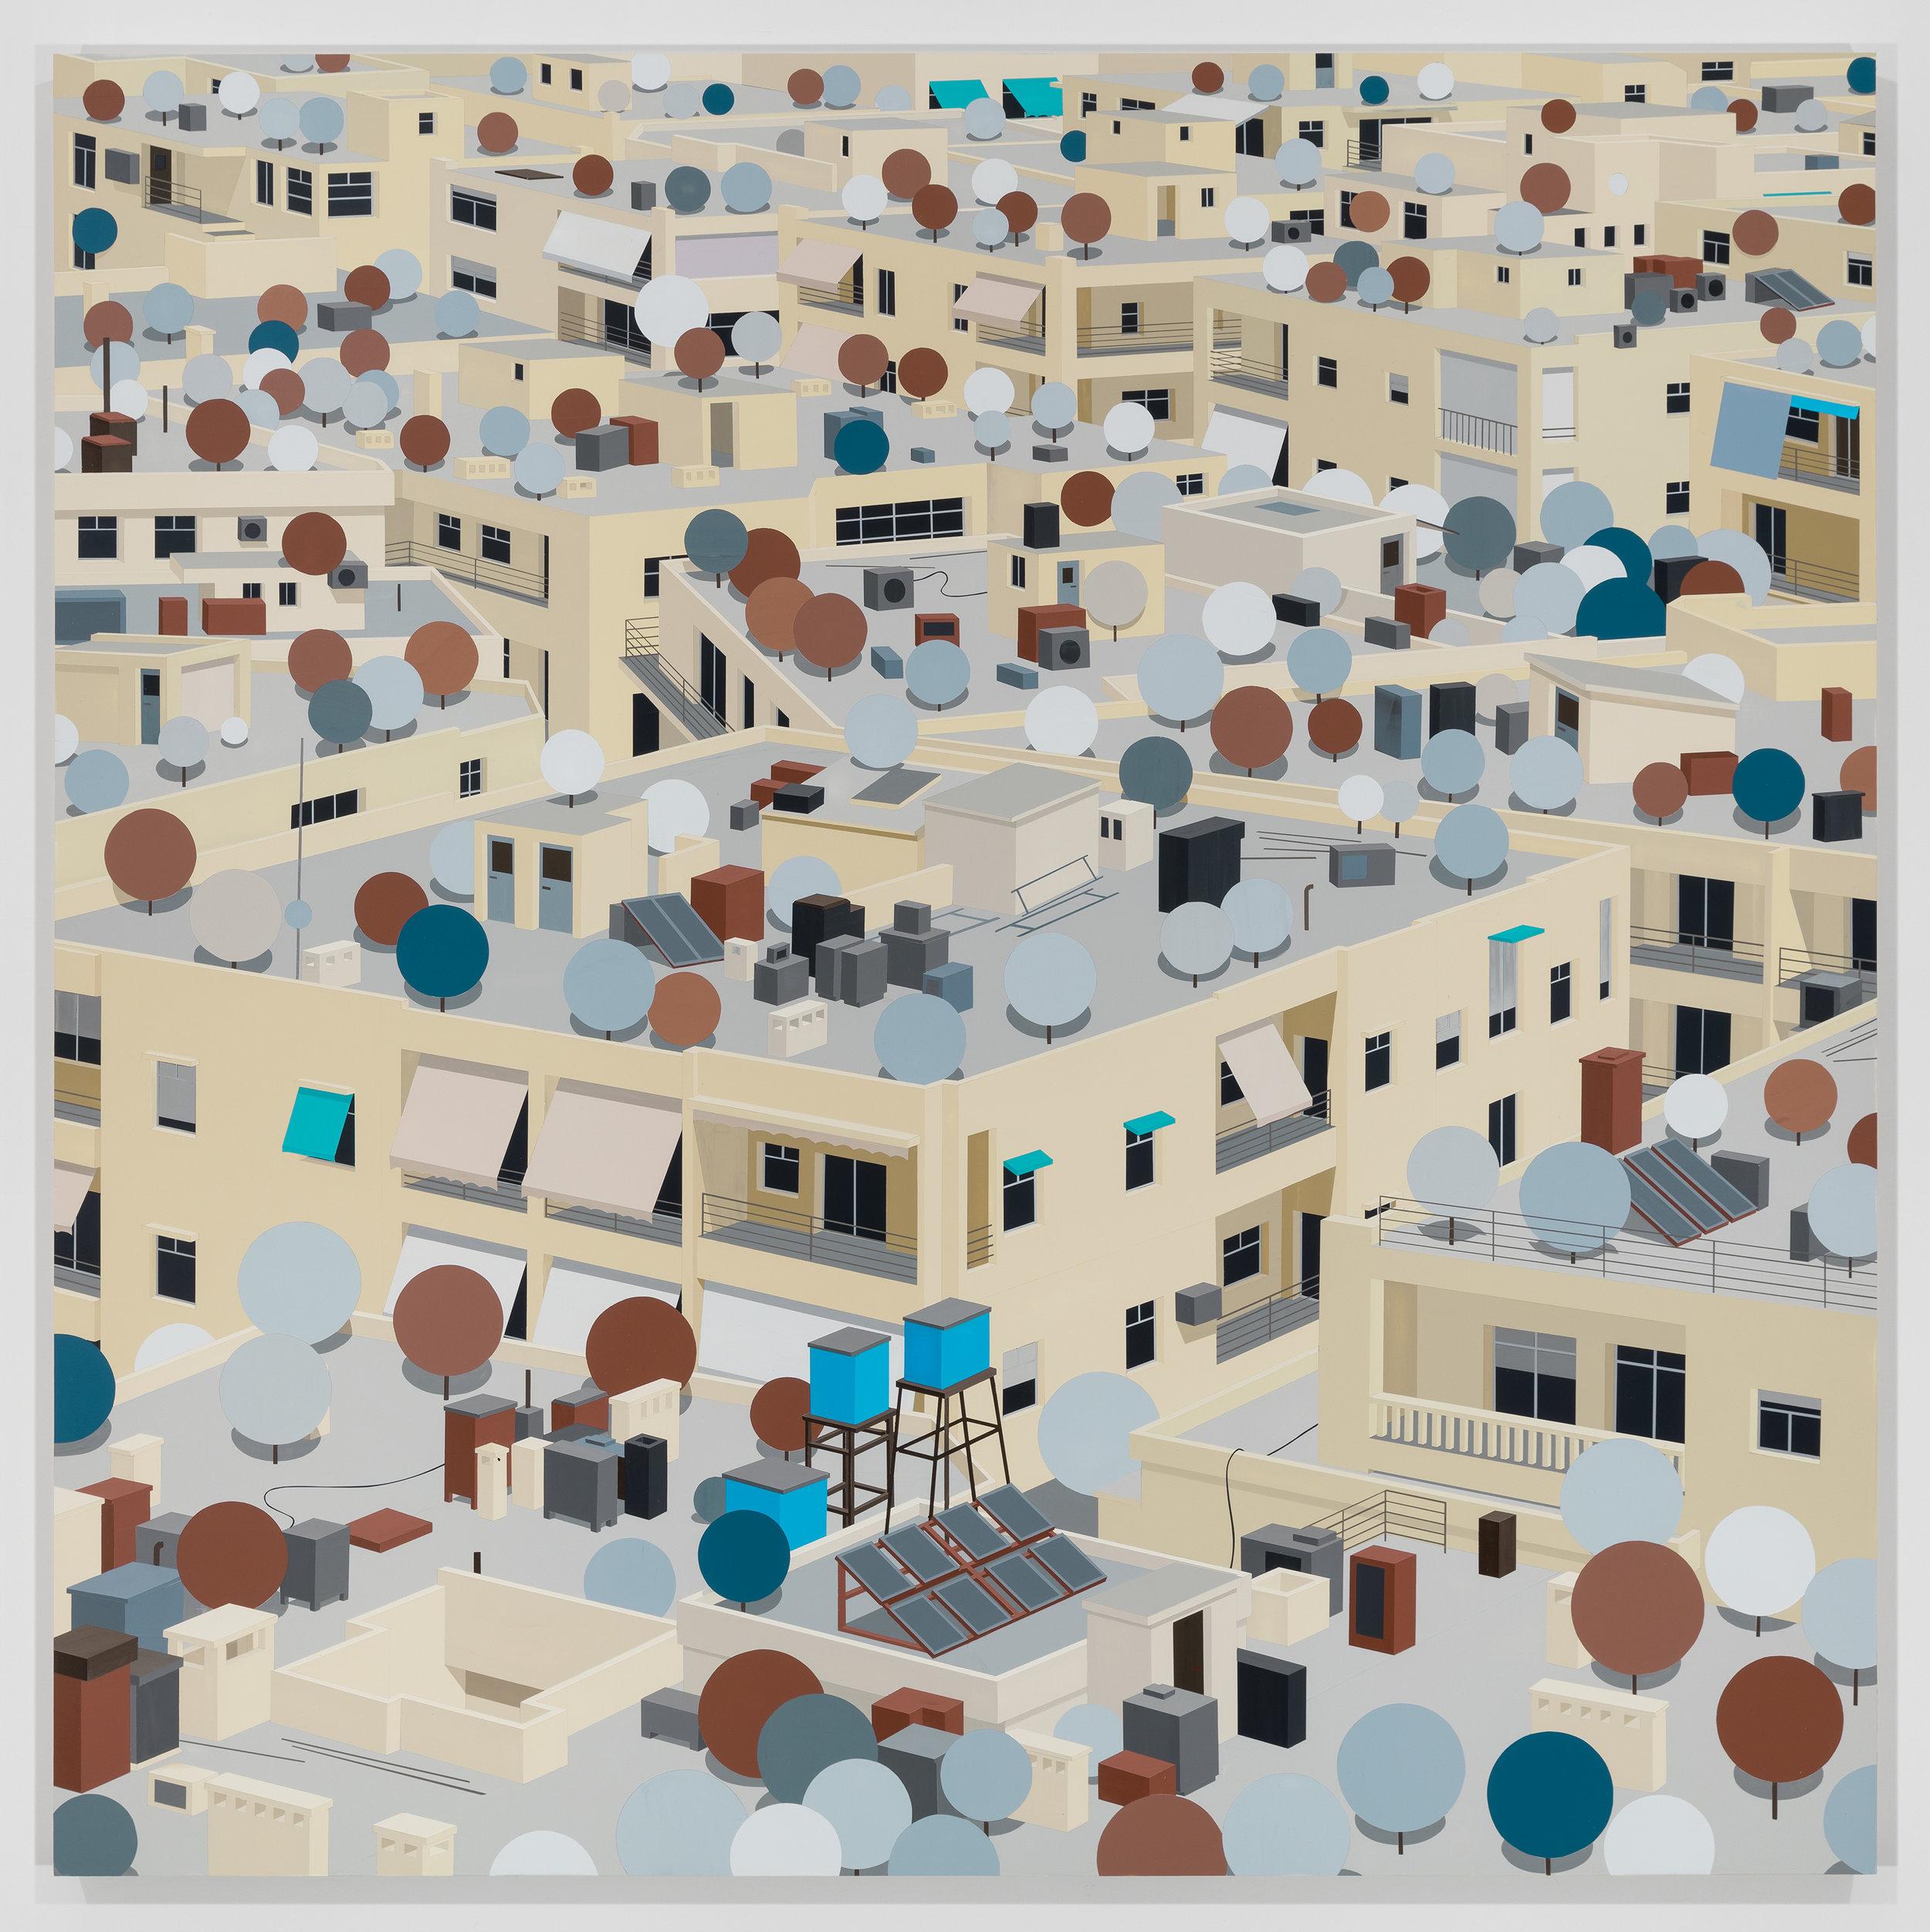 Aleppo, March 15th, 2011. 2018. Acrylic on Dibond, 100 x 100 cm